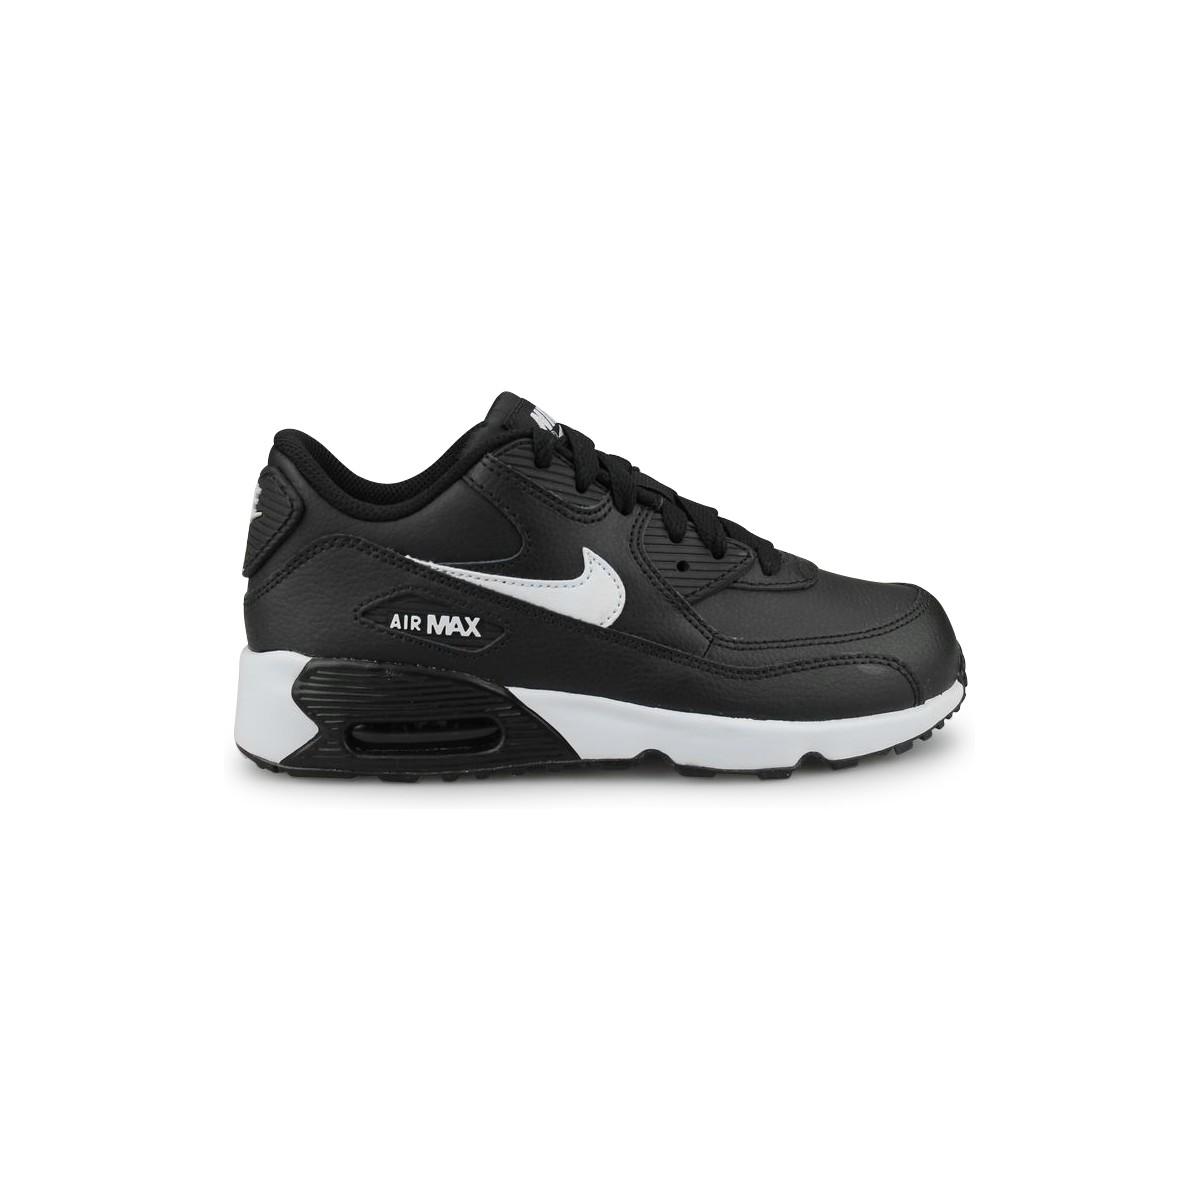 promo code d2f17 8baa0 Nike Air Max 90 Leather Enfant Noir - Street Shoes Addict